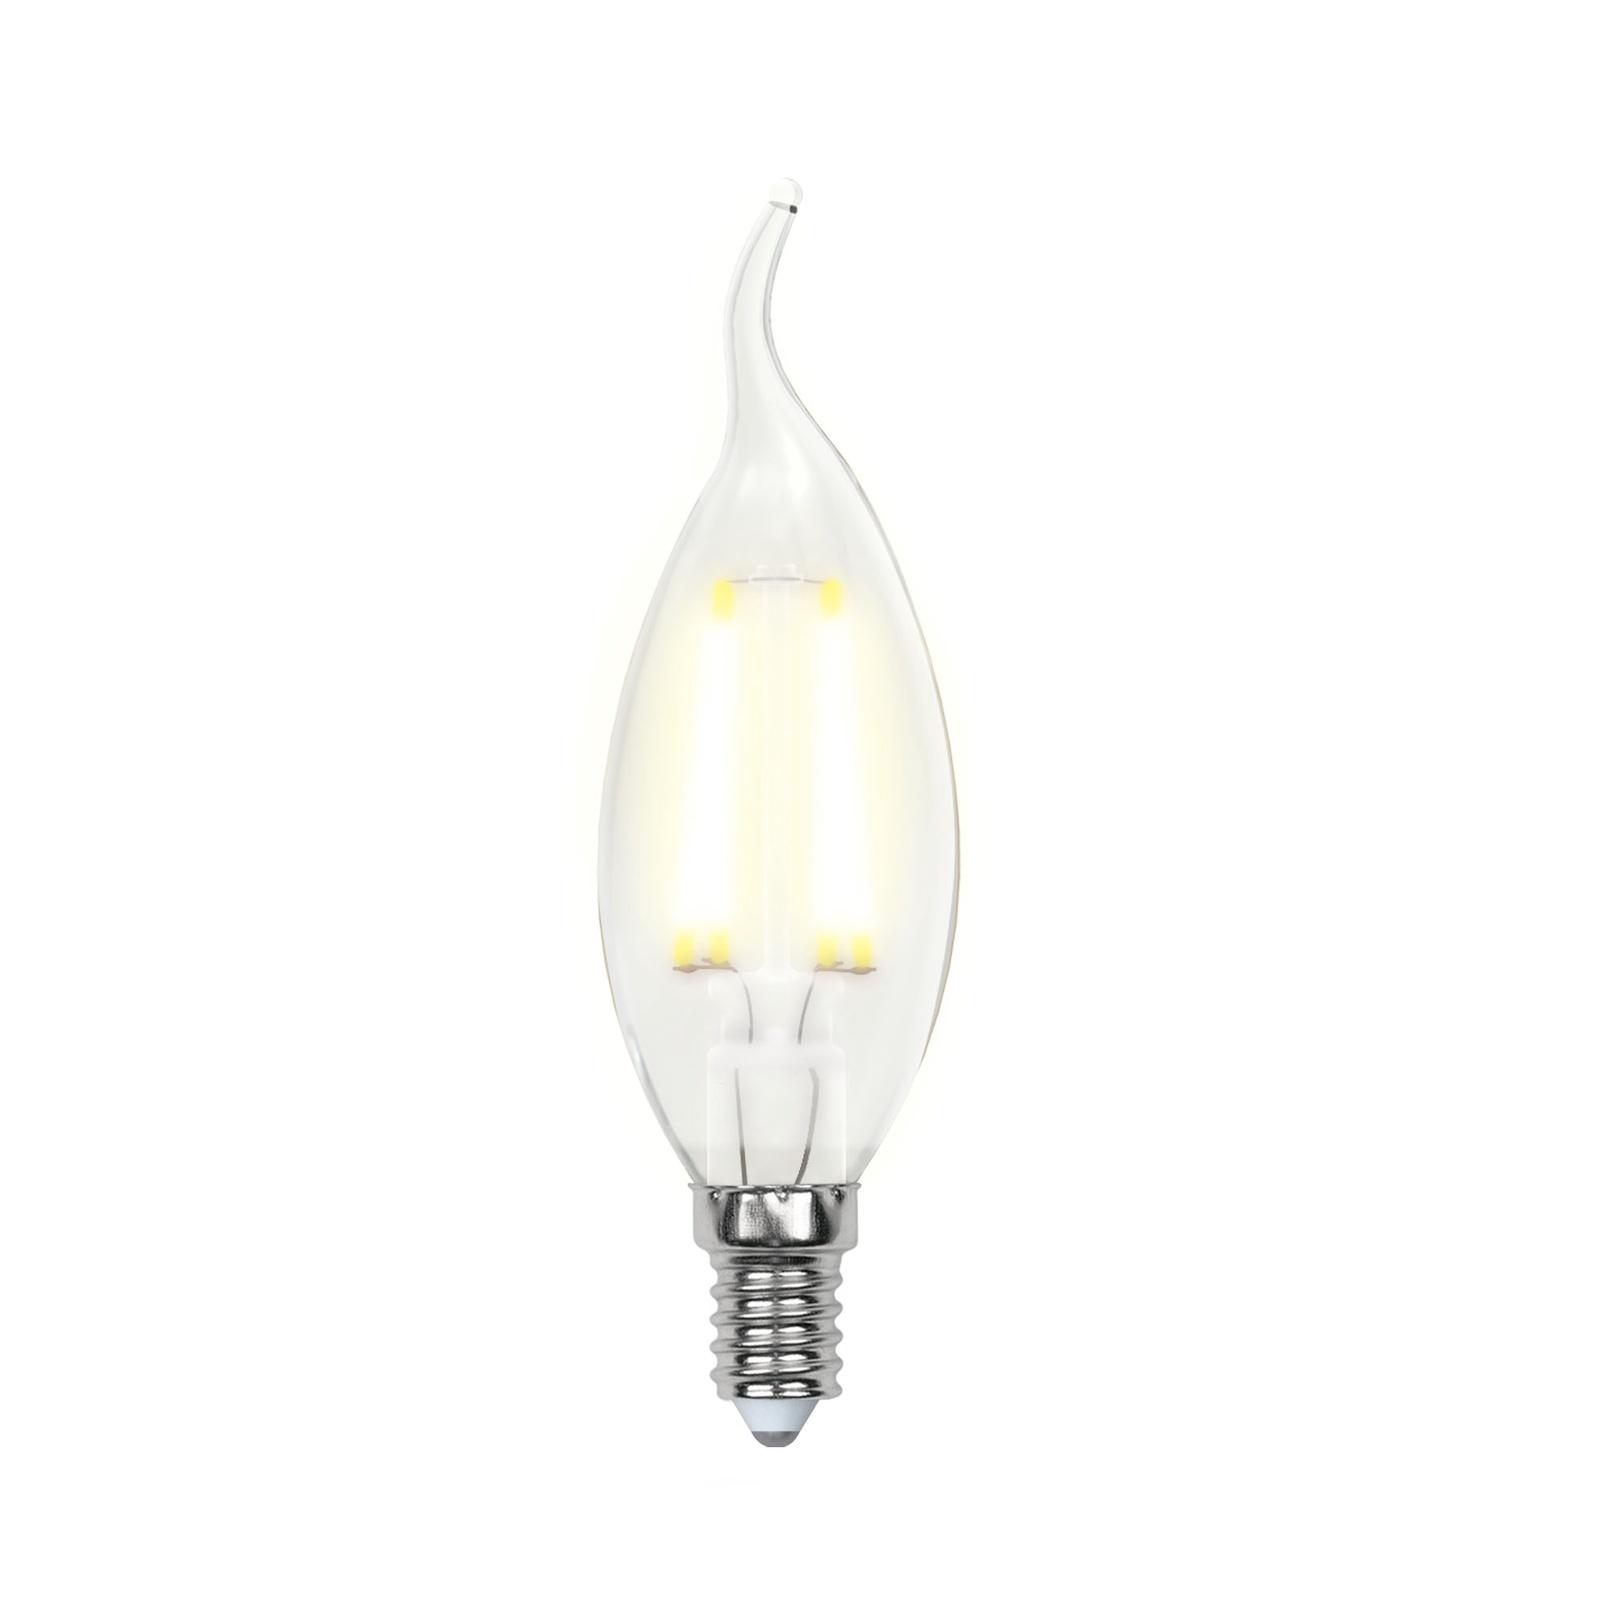 Лампочка Uniel LED-CW35-6W/WW/E14/FR 3000K, Теплый свет 6 Вт, Светодиодная